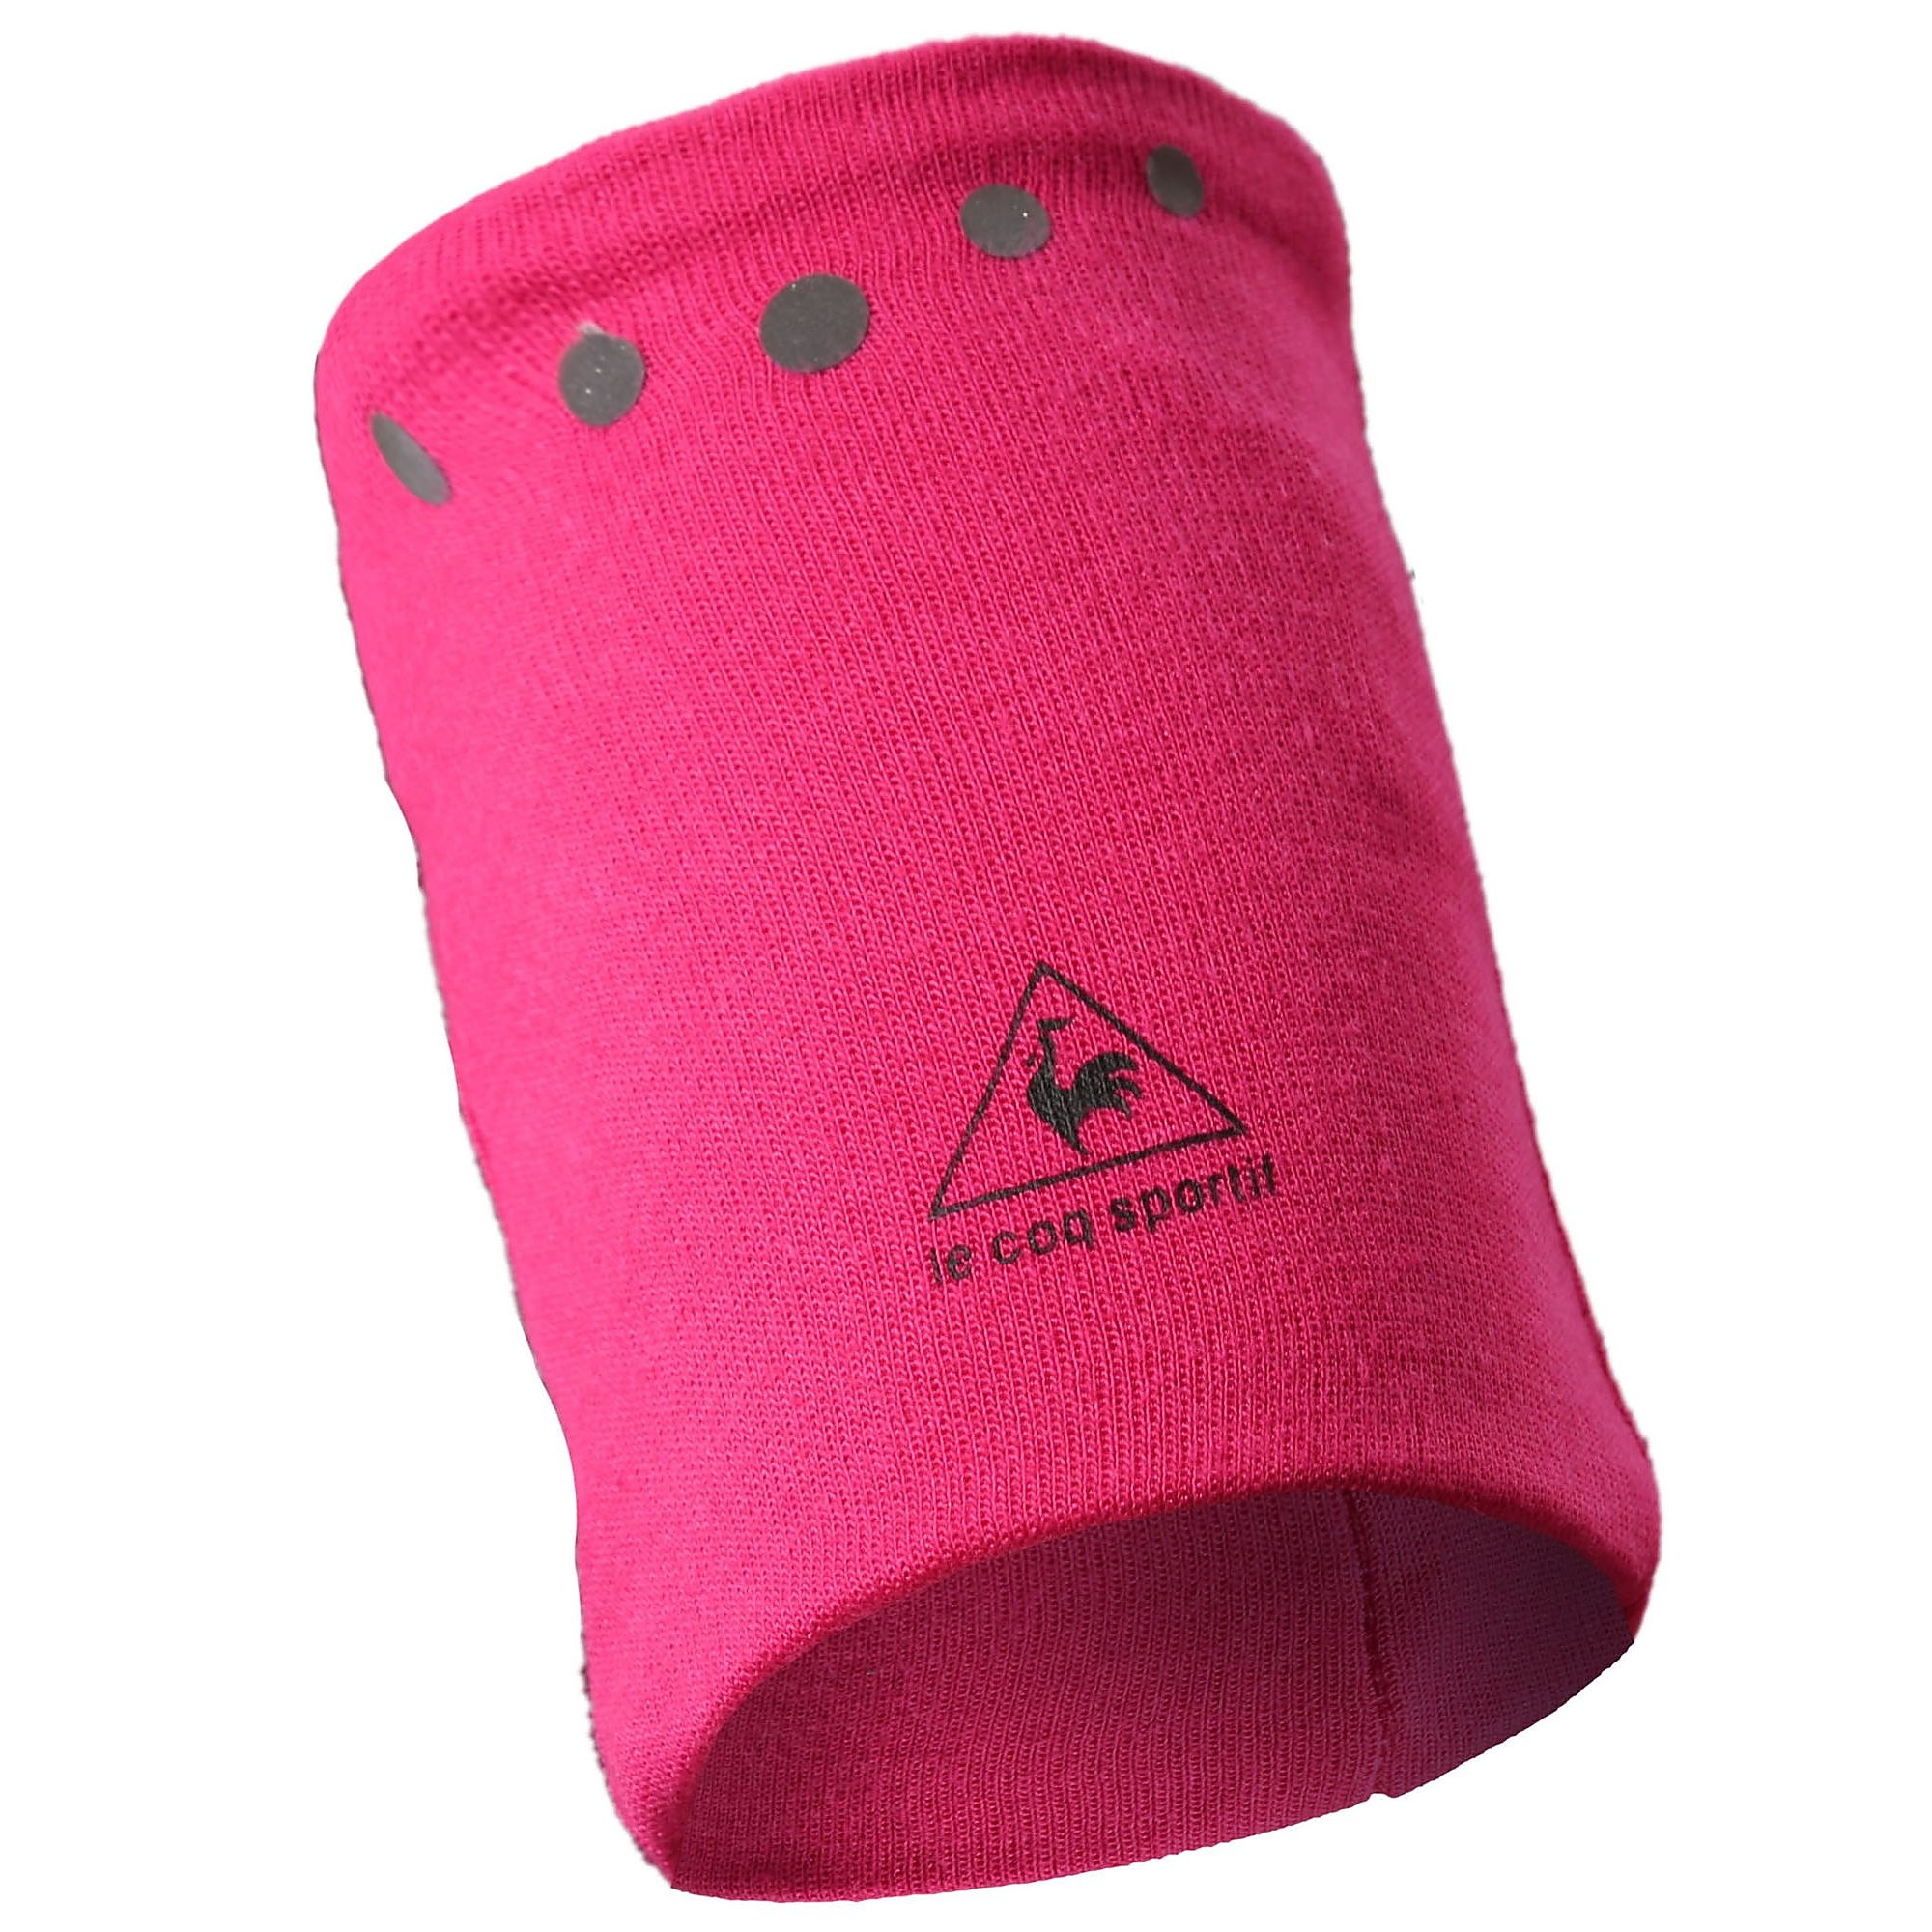 Le Coq Sportif zweetband/haarband roze